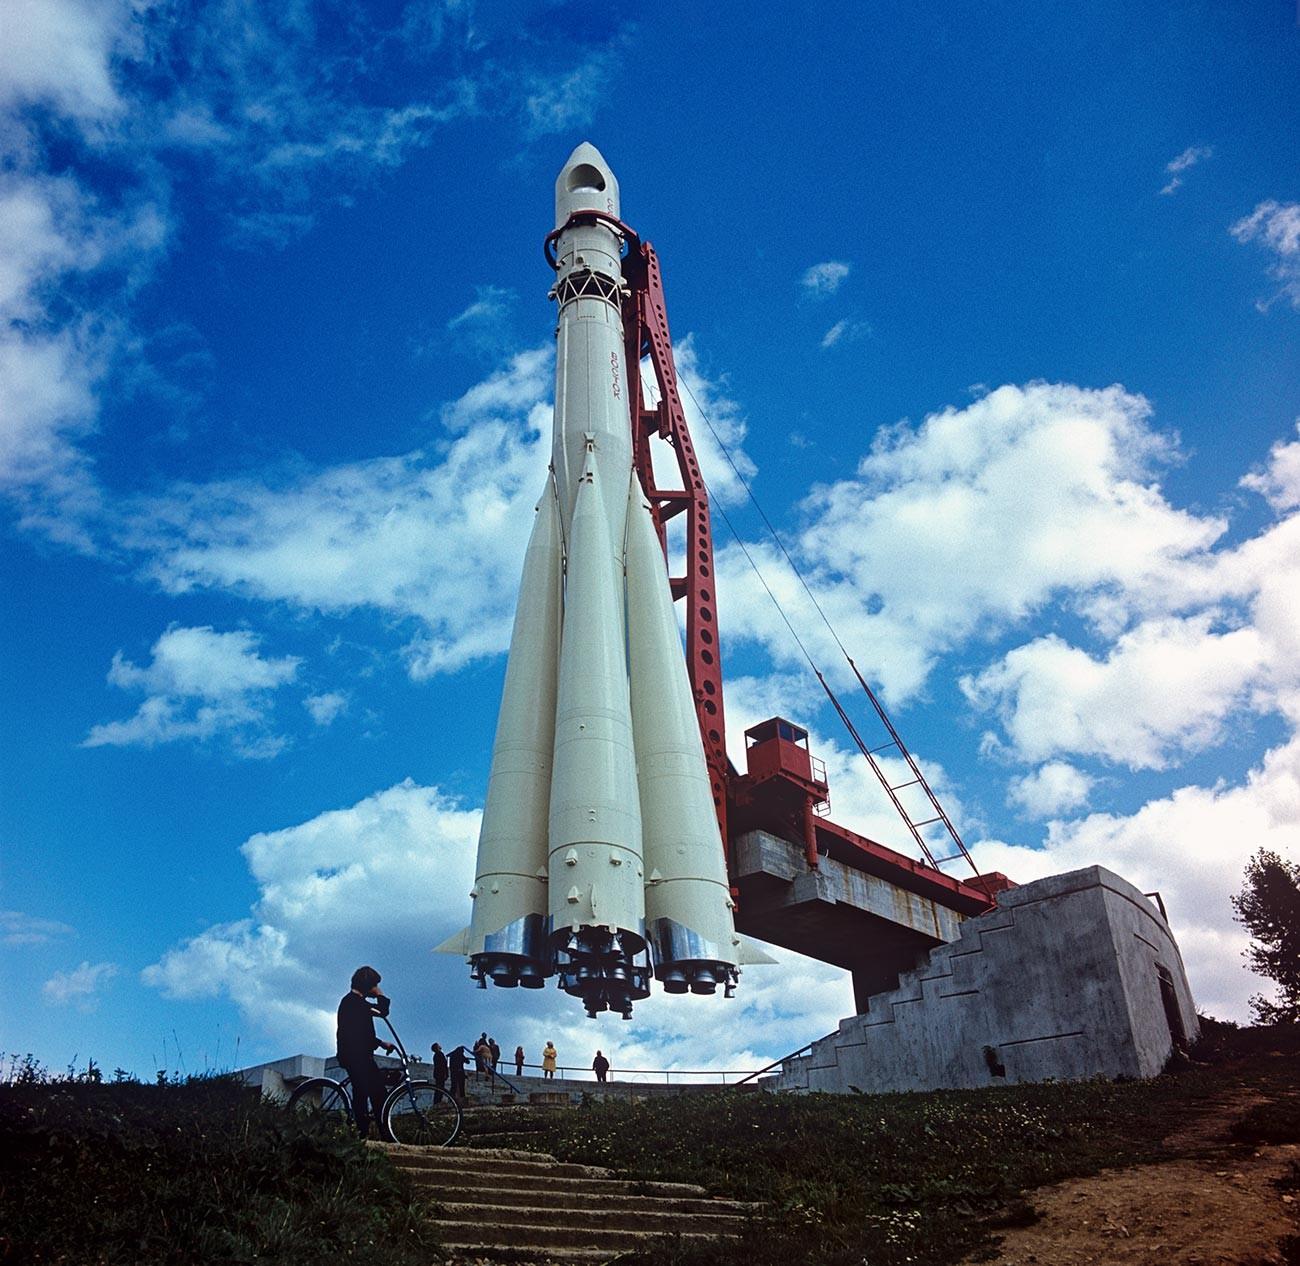 Vostok, modifikasi lain dari R-7.